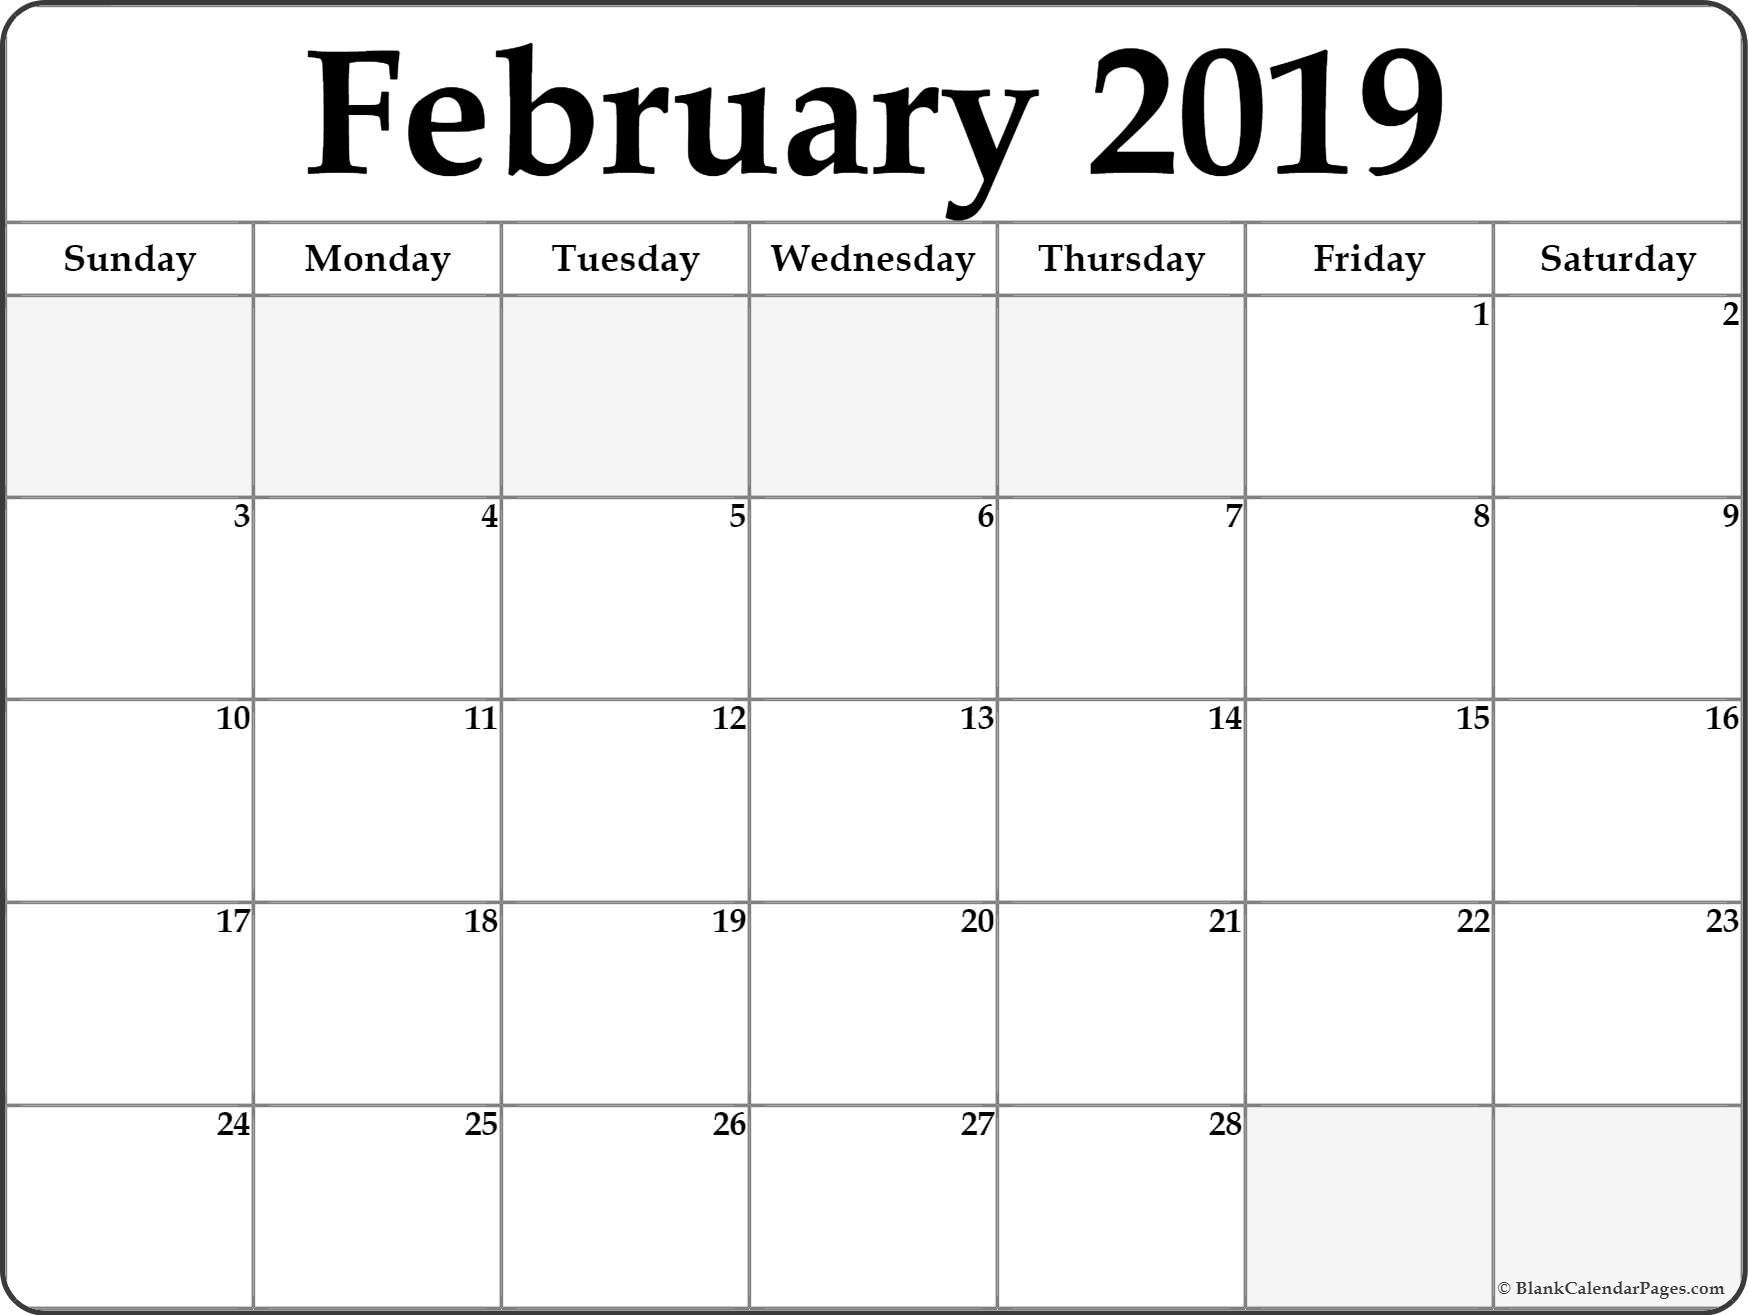 Feb 2019 Calendar Template Feb Feb2019 Holidays 2019calendar